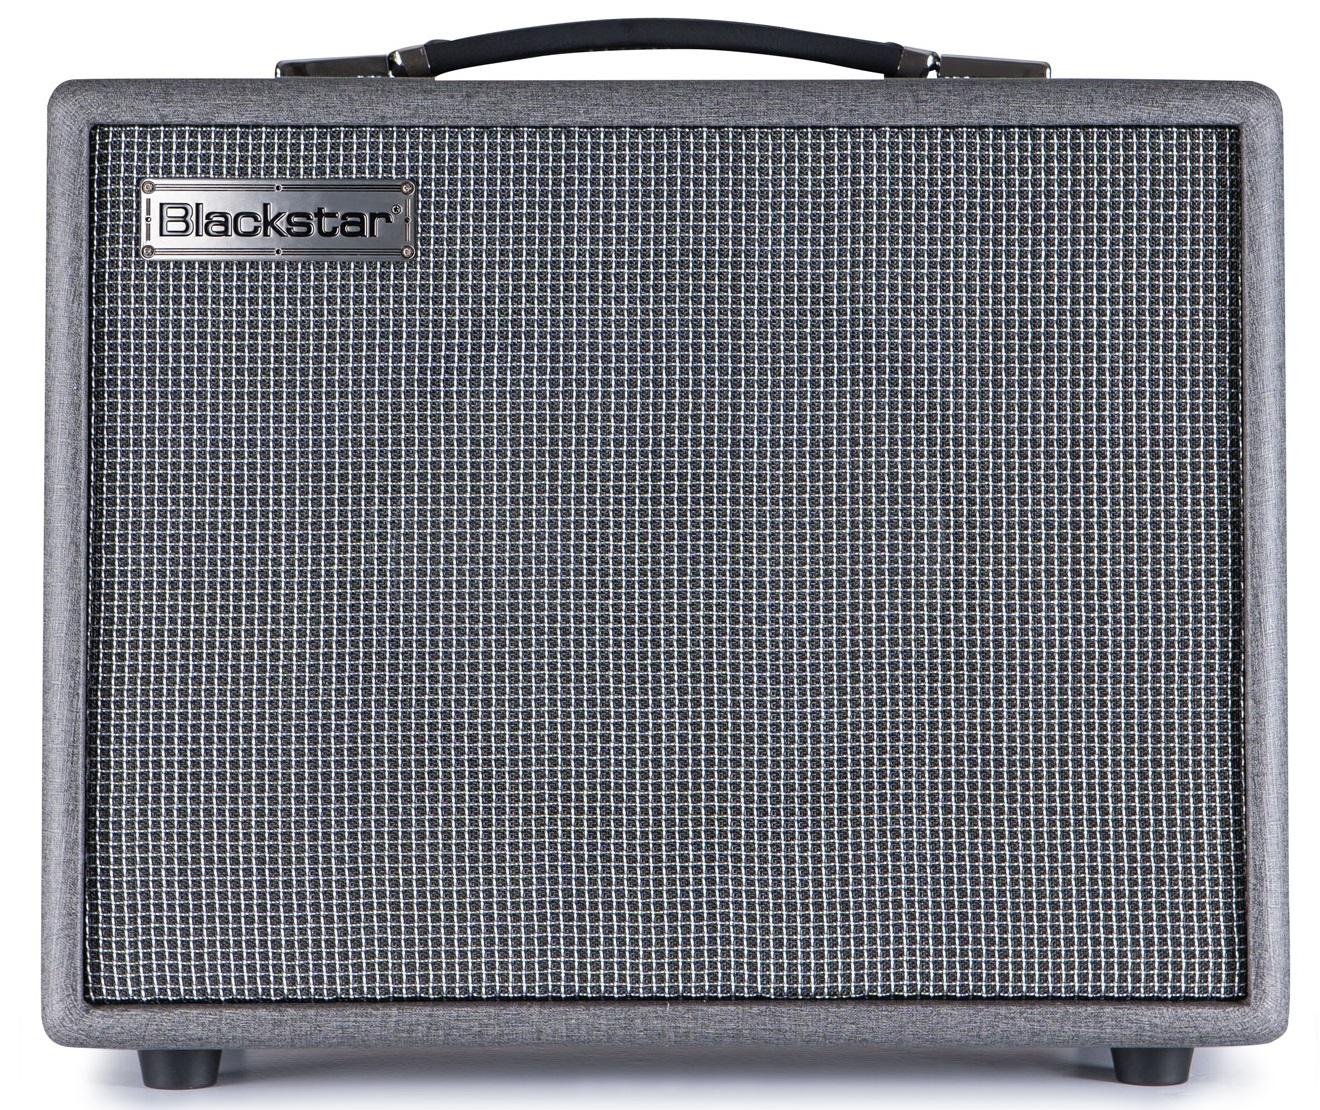 Blackstar Silverline Standard 20W 1x10